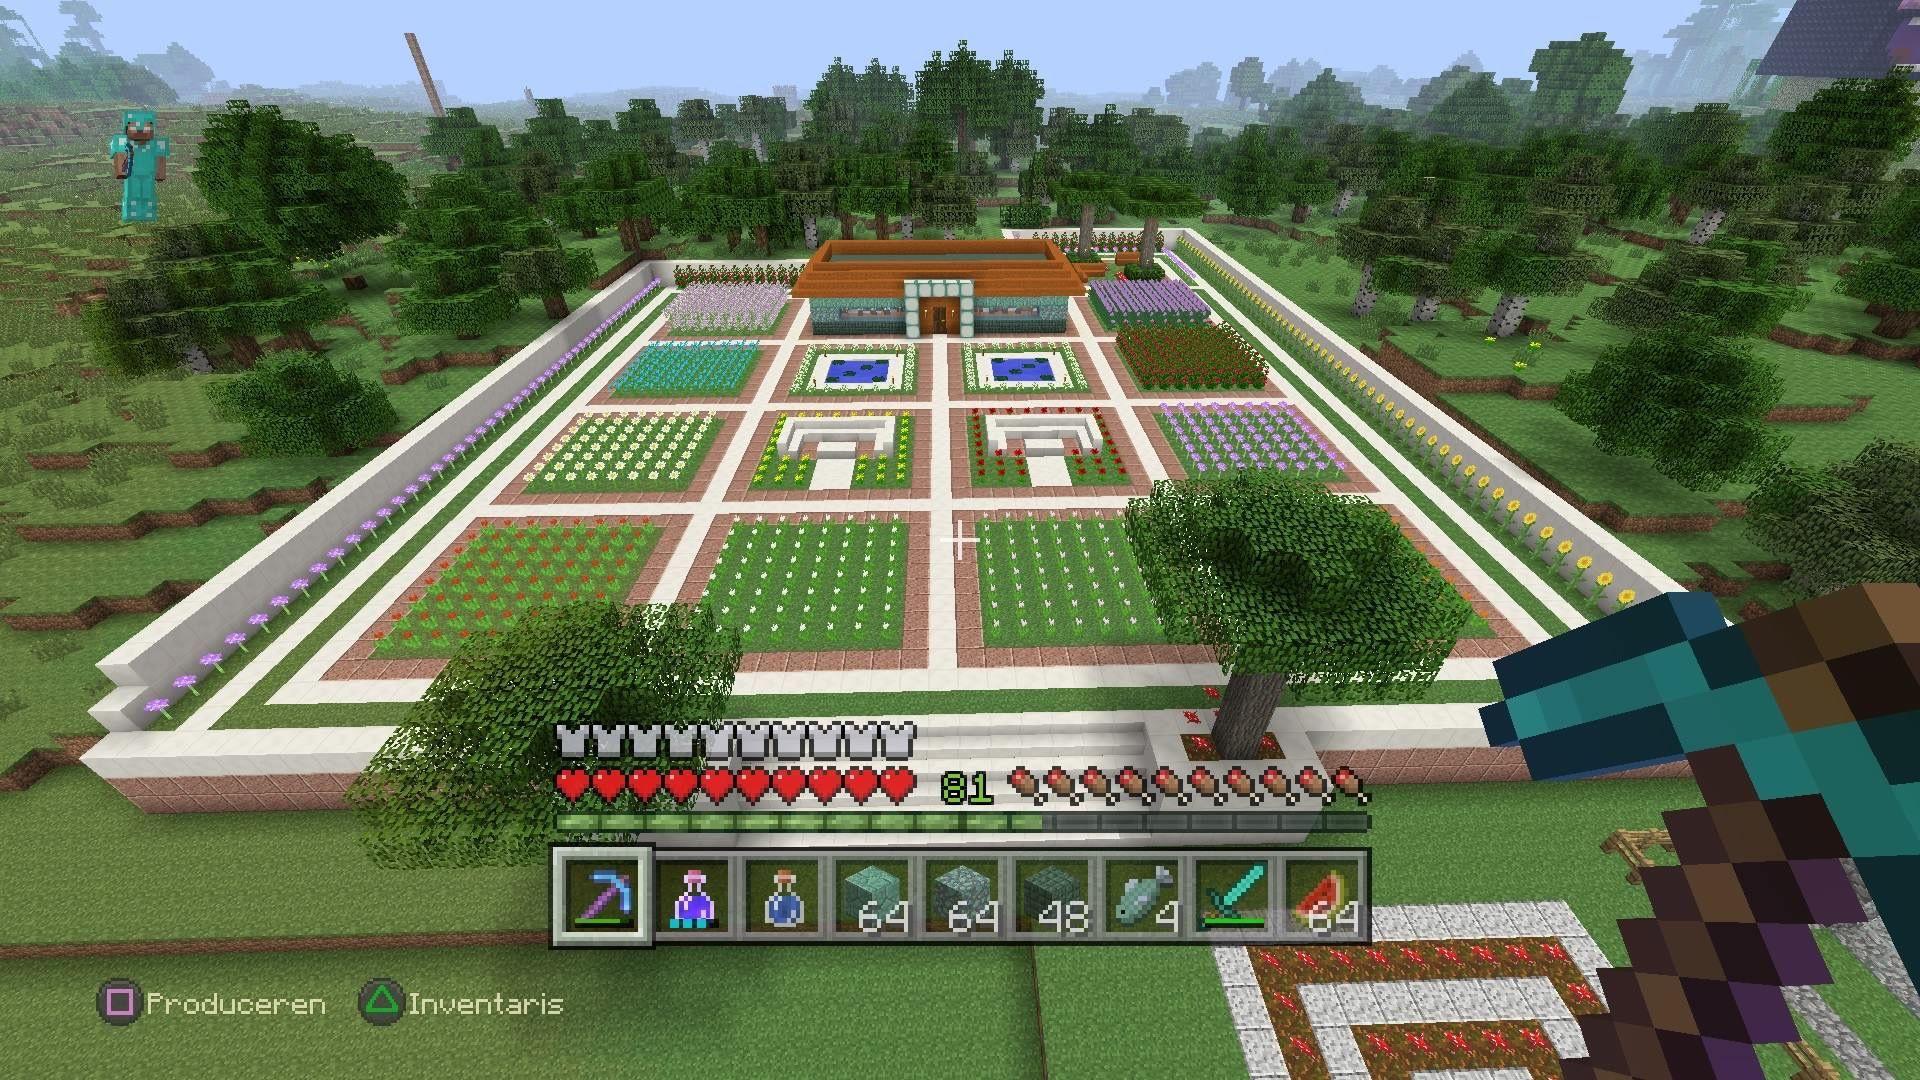 minecraft how to build a garden